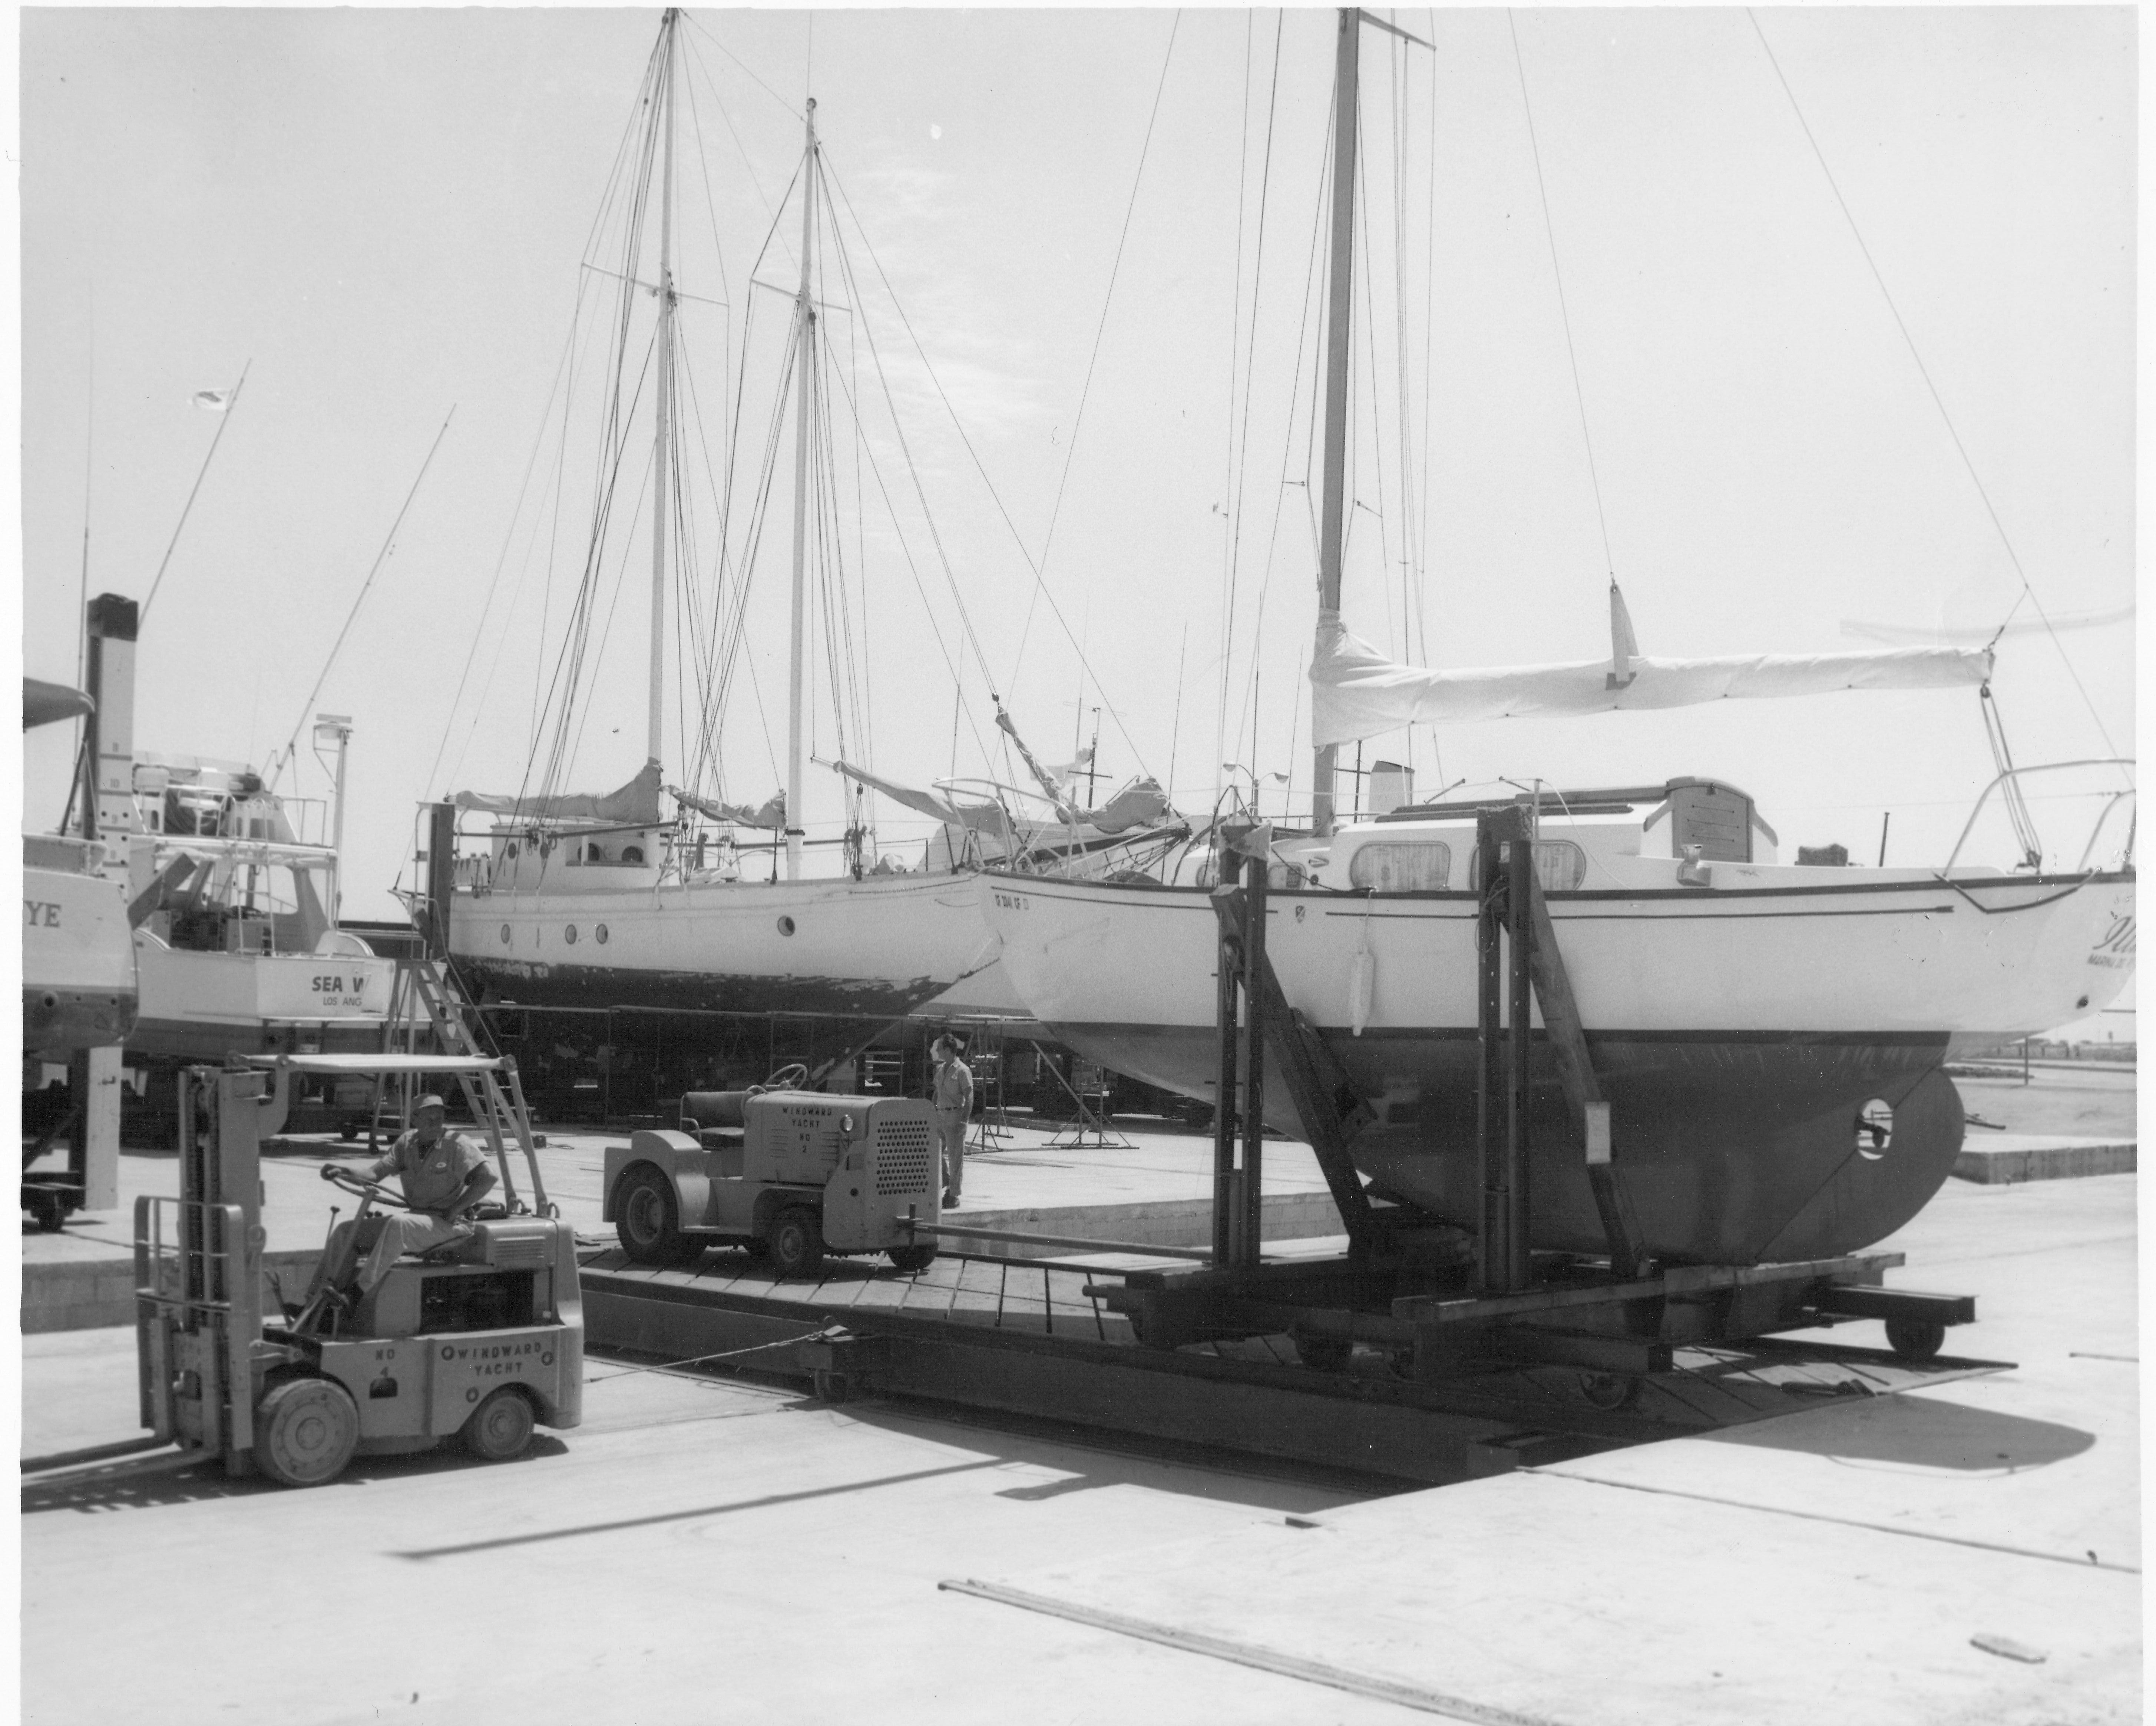 Yacht Haul